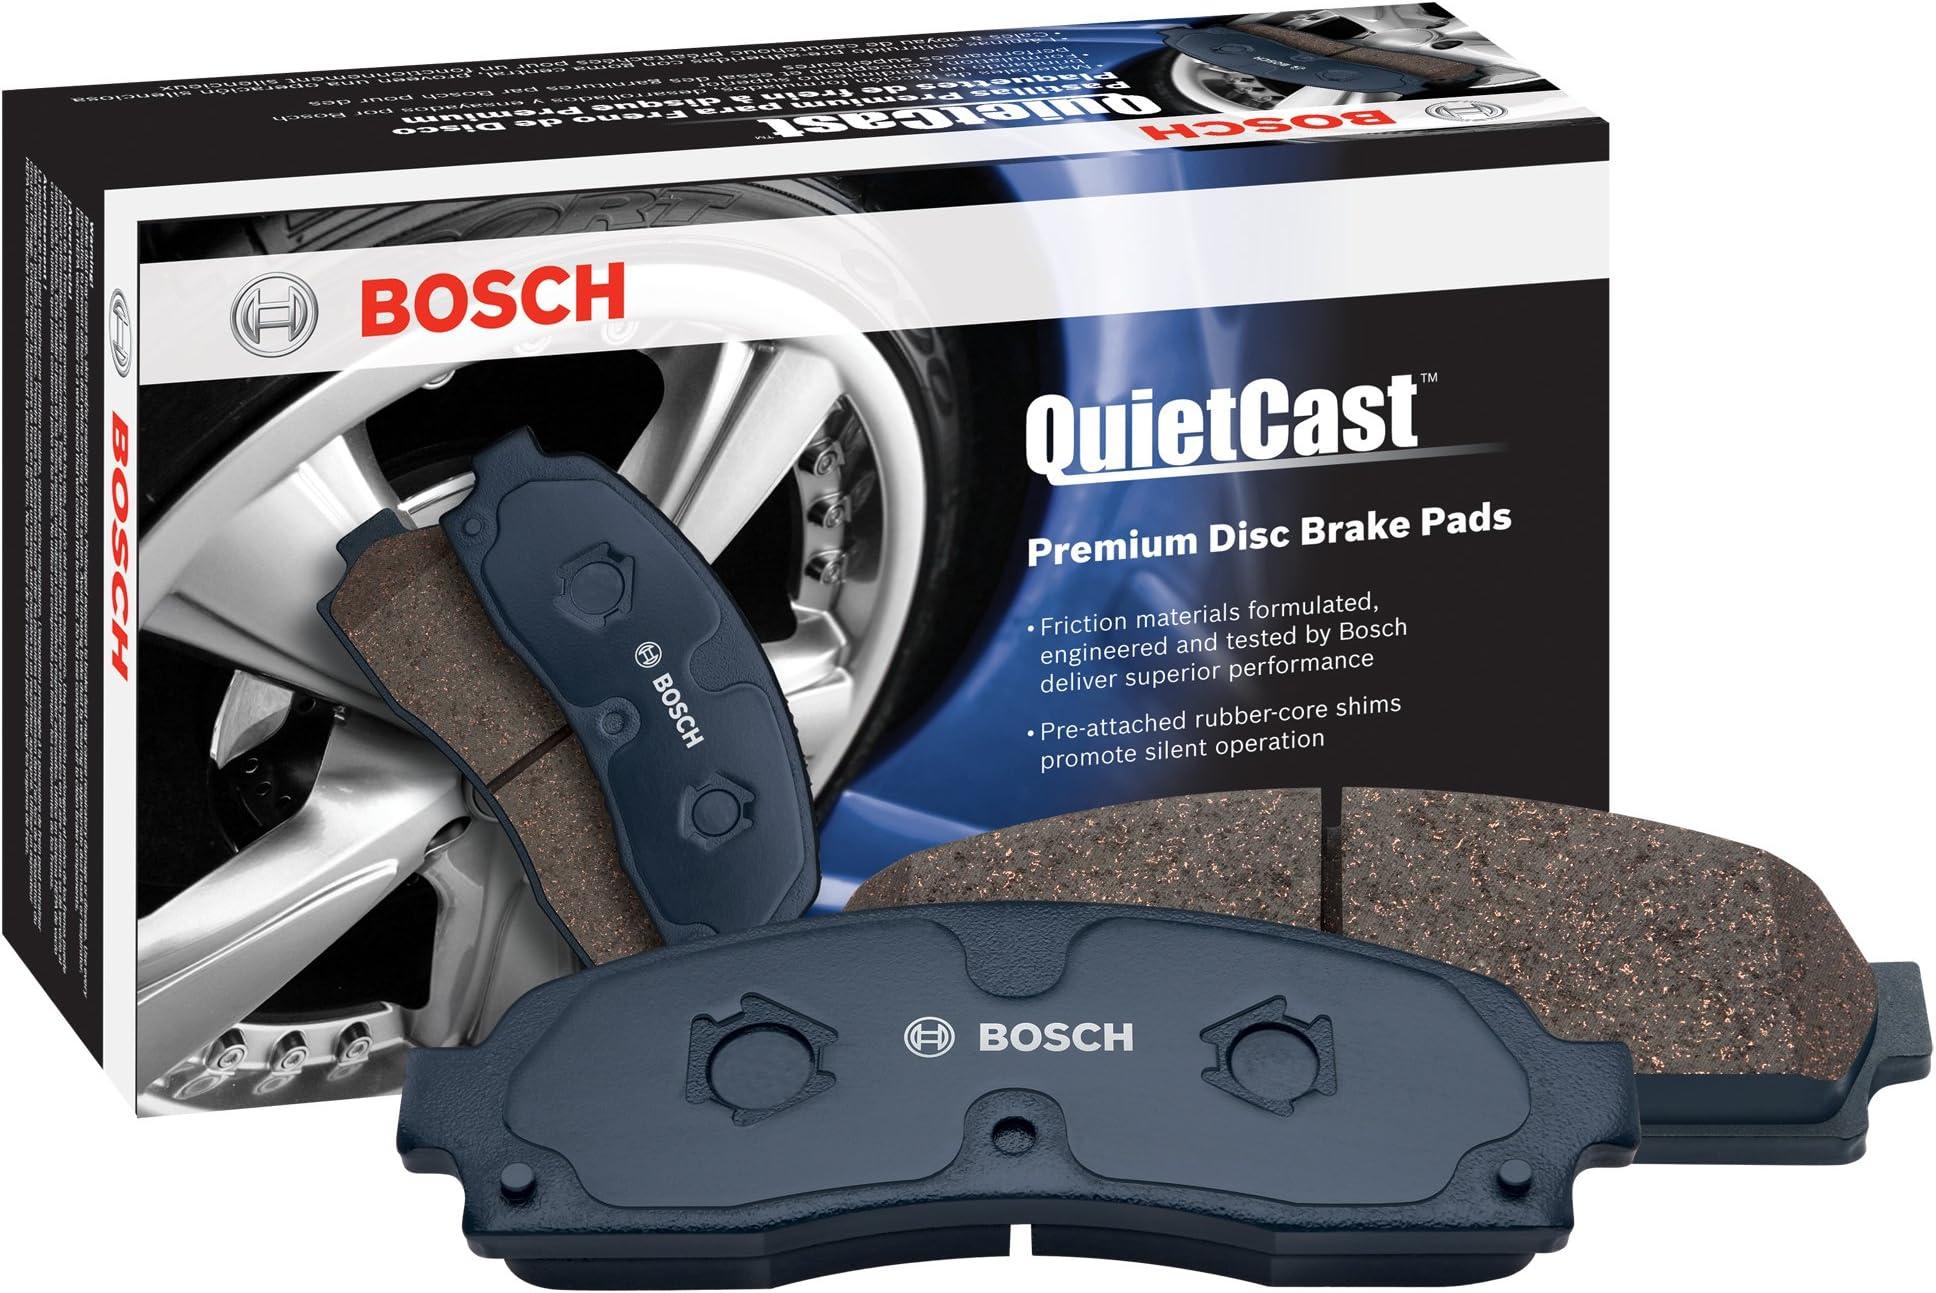 Bosch BP1316 QuietCast Premium Semi-Metallic Disc Brake Pad Set For Select Dodge Sprinter 2500; Freightliner Sprinter 2500; Mercedes-Benz Sprinter 2500; Volkswagen Crafter; Front